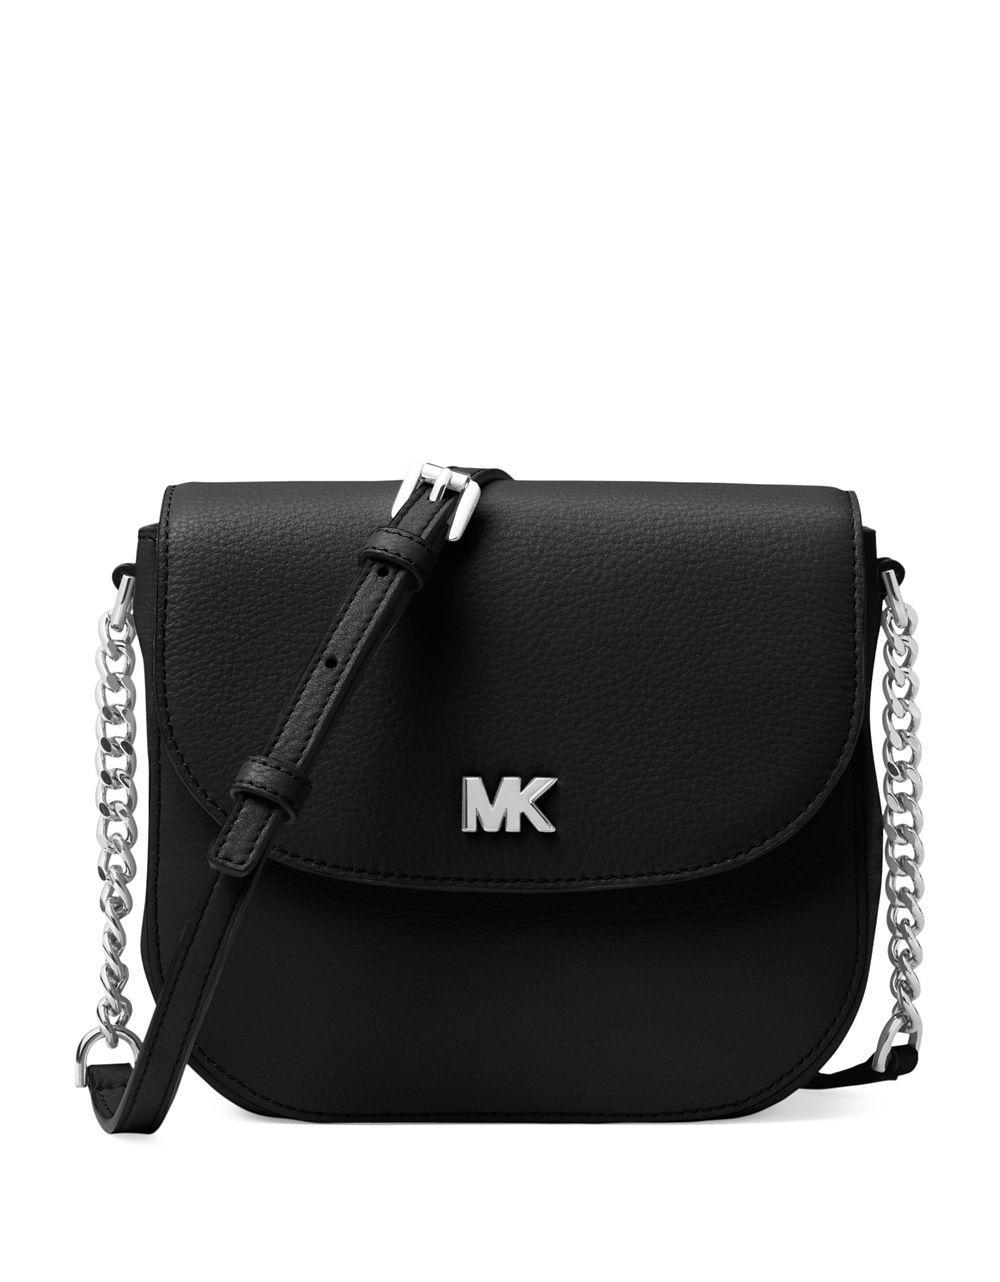 Michael Michael Kors Half Dome Crossbody Bag in Black Small Pebble Leather MTJJPrQ4z